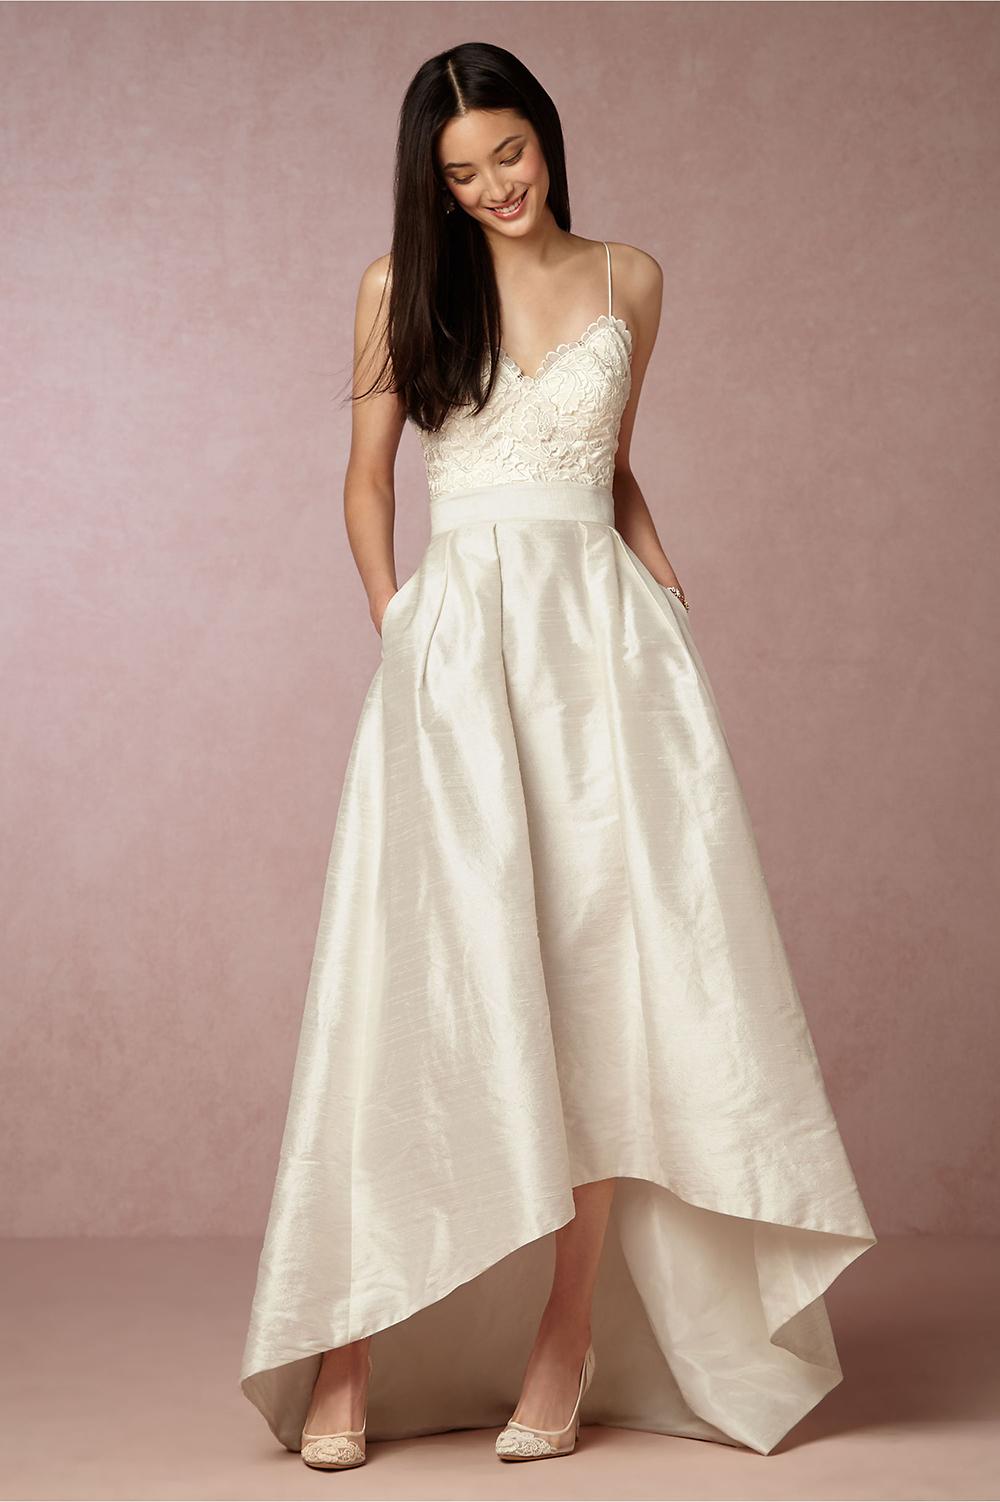 BHLDN Havana Corset & Bellamy Skirt - BHLDN Wedding Gowns